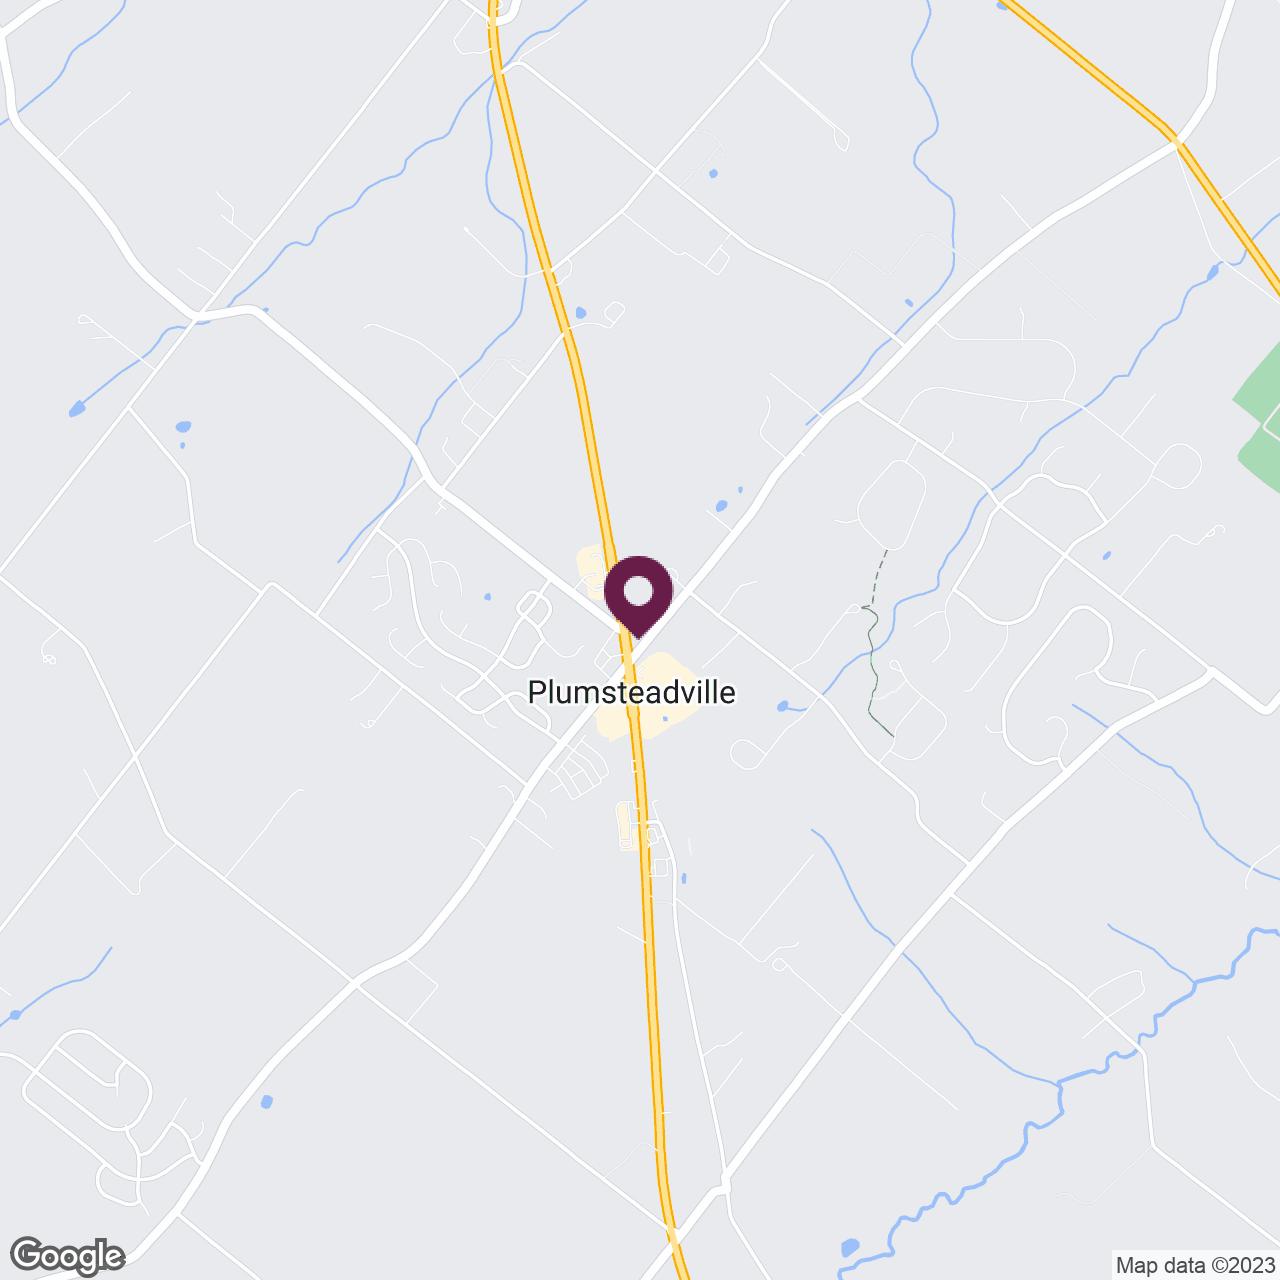 Google Maps static image of Bucks County